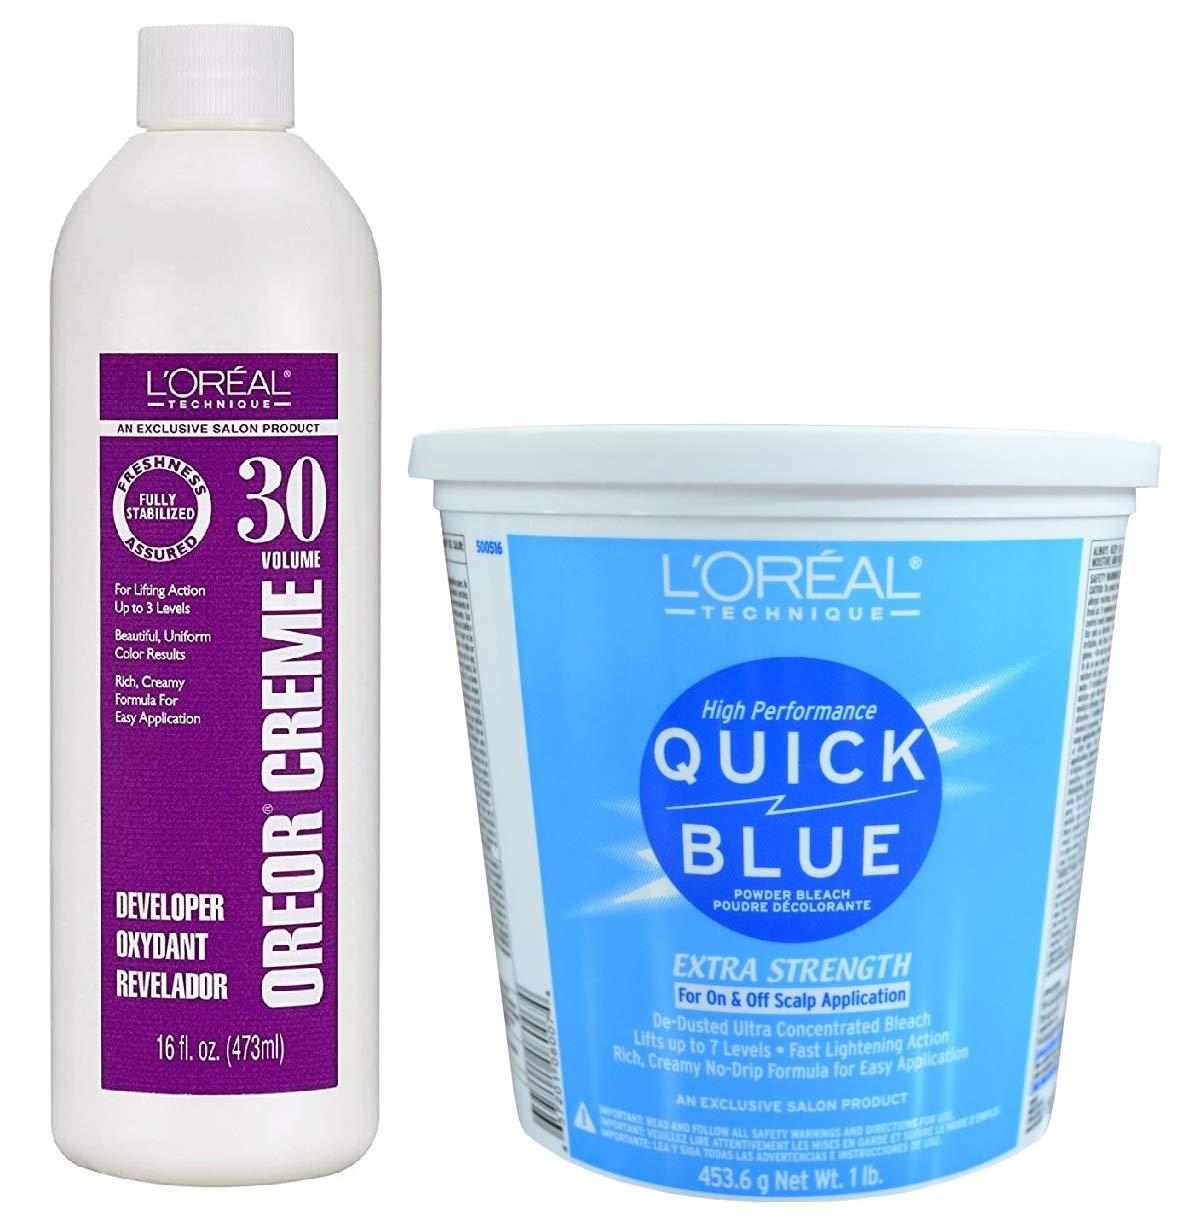 L'Oreal Technique Quick Blue Powder Bleach Extra Strength 1lb w/30 Volume Oreor Developer 16oz Bundle